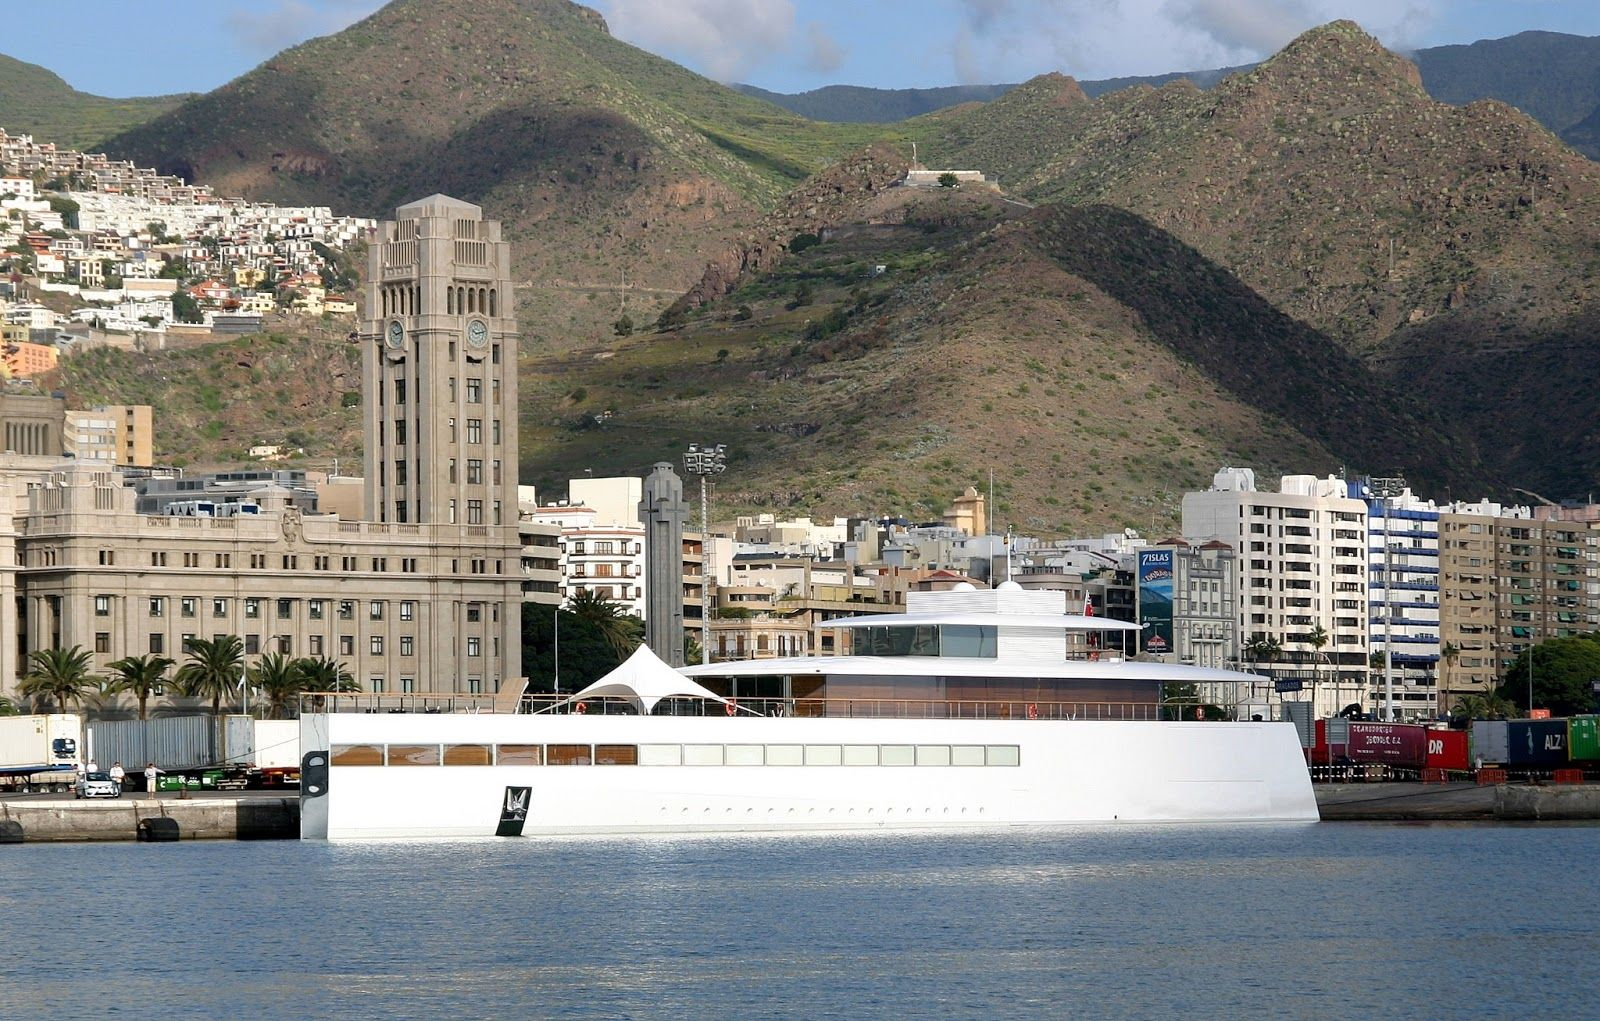 Yacht Design Jobs venus yacht | steve jobs yacht venus | design │ boats | boats